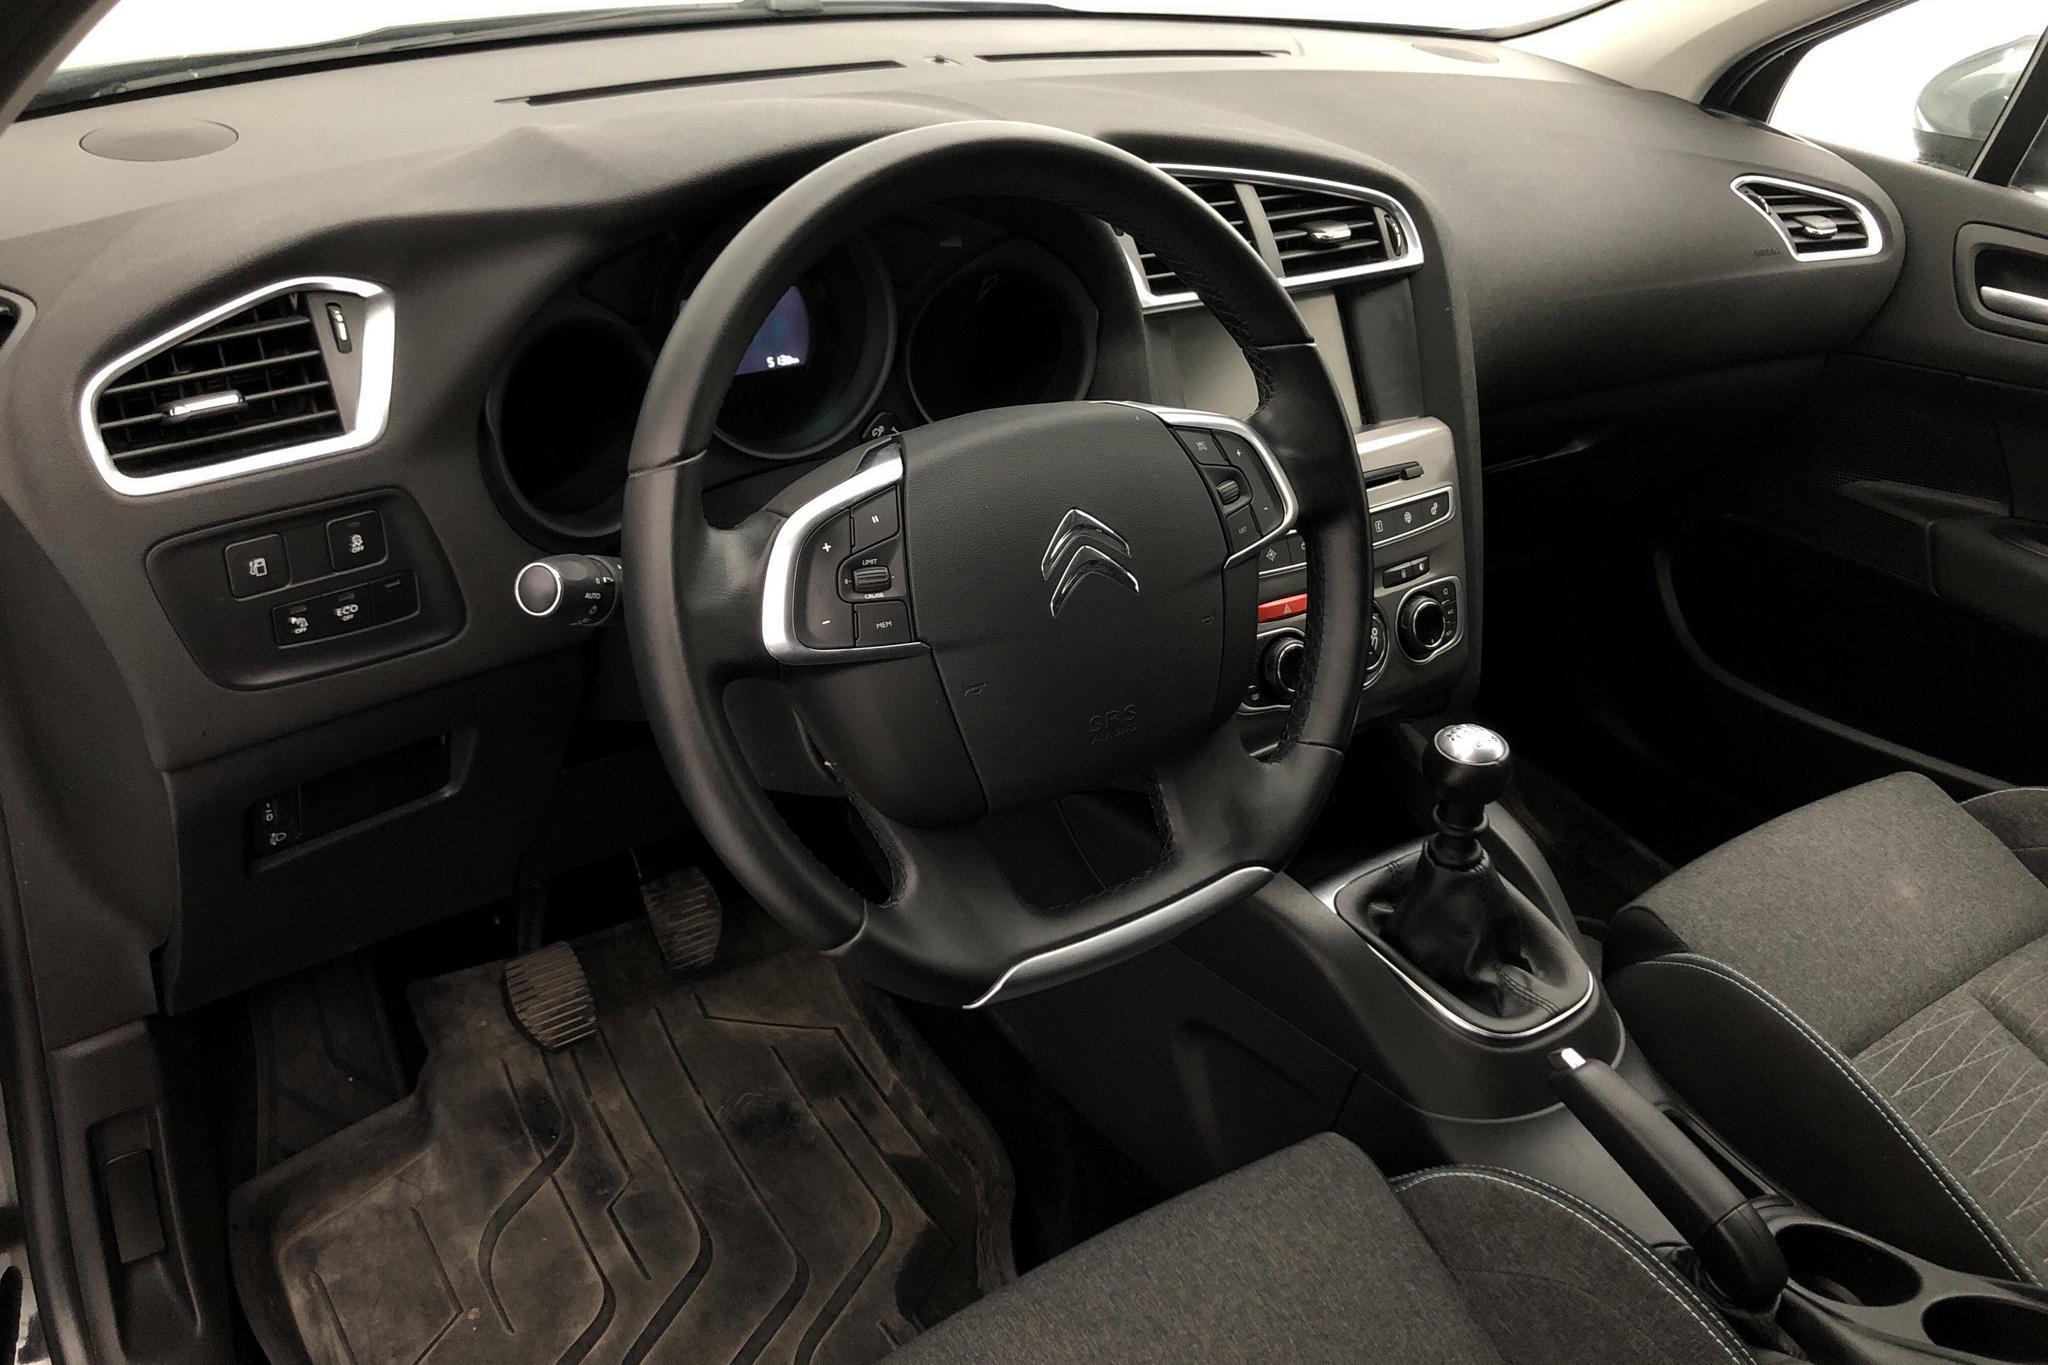 Citroen C4 Puretech (130hk) - 64 430 km - Manual - black - 2016